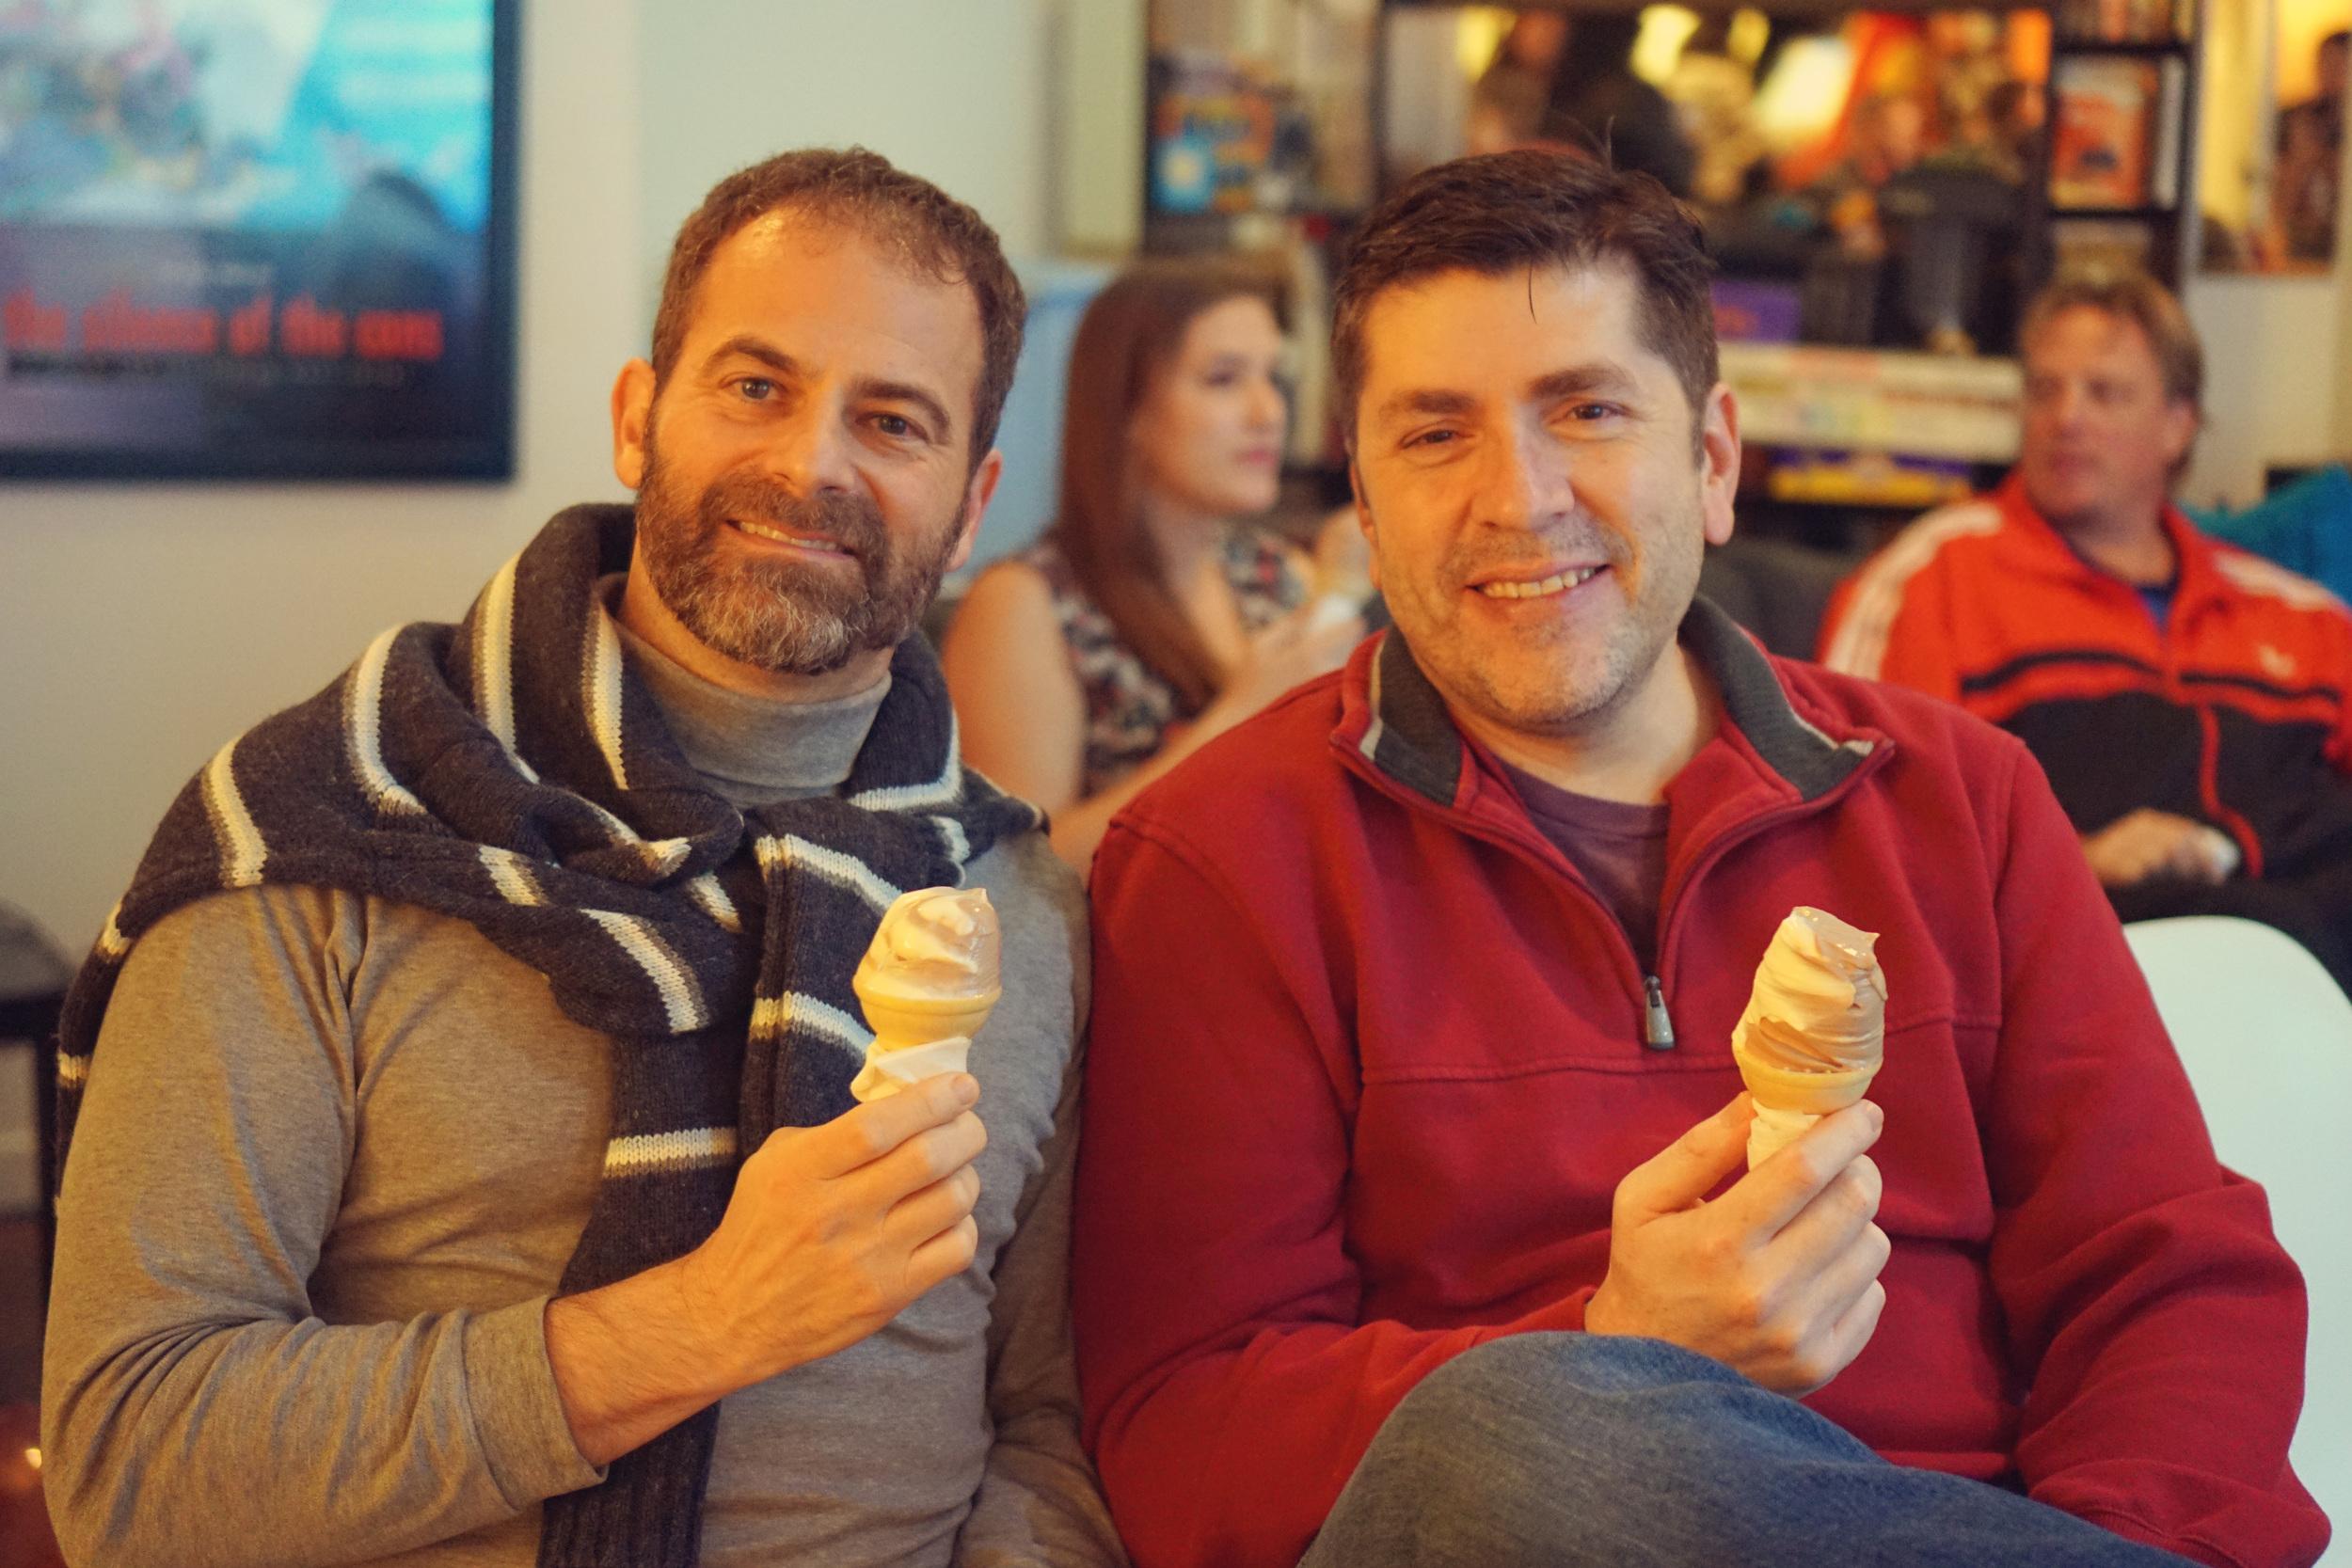 DSC02318 Stewart and Rubin and Their Ice Cream Cones.JPG